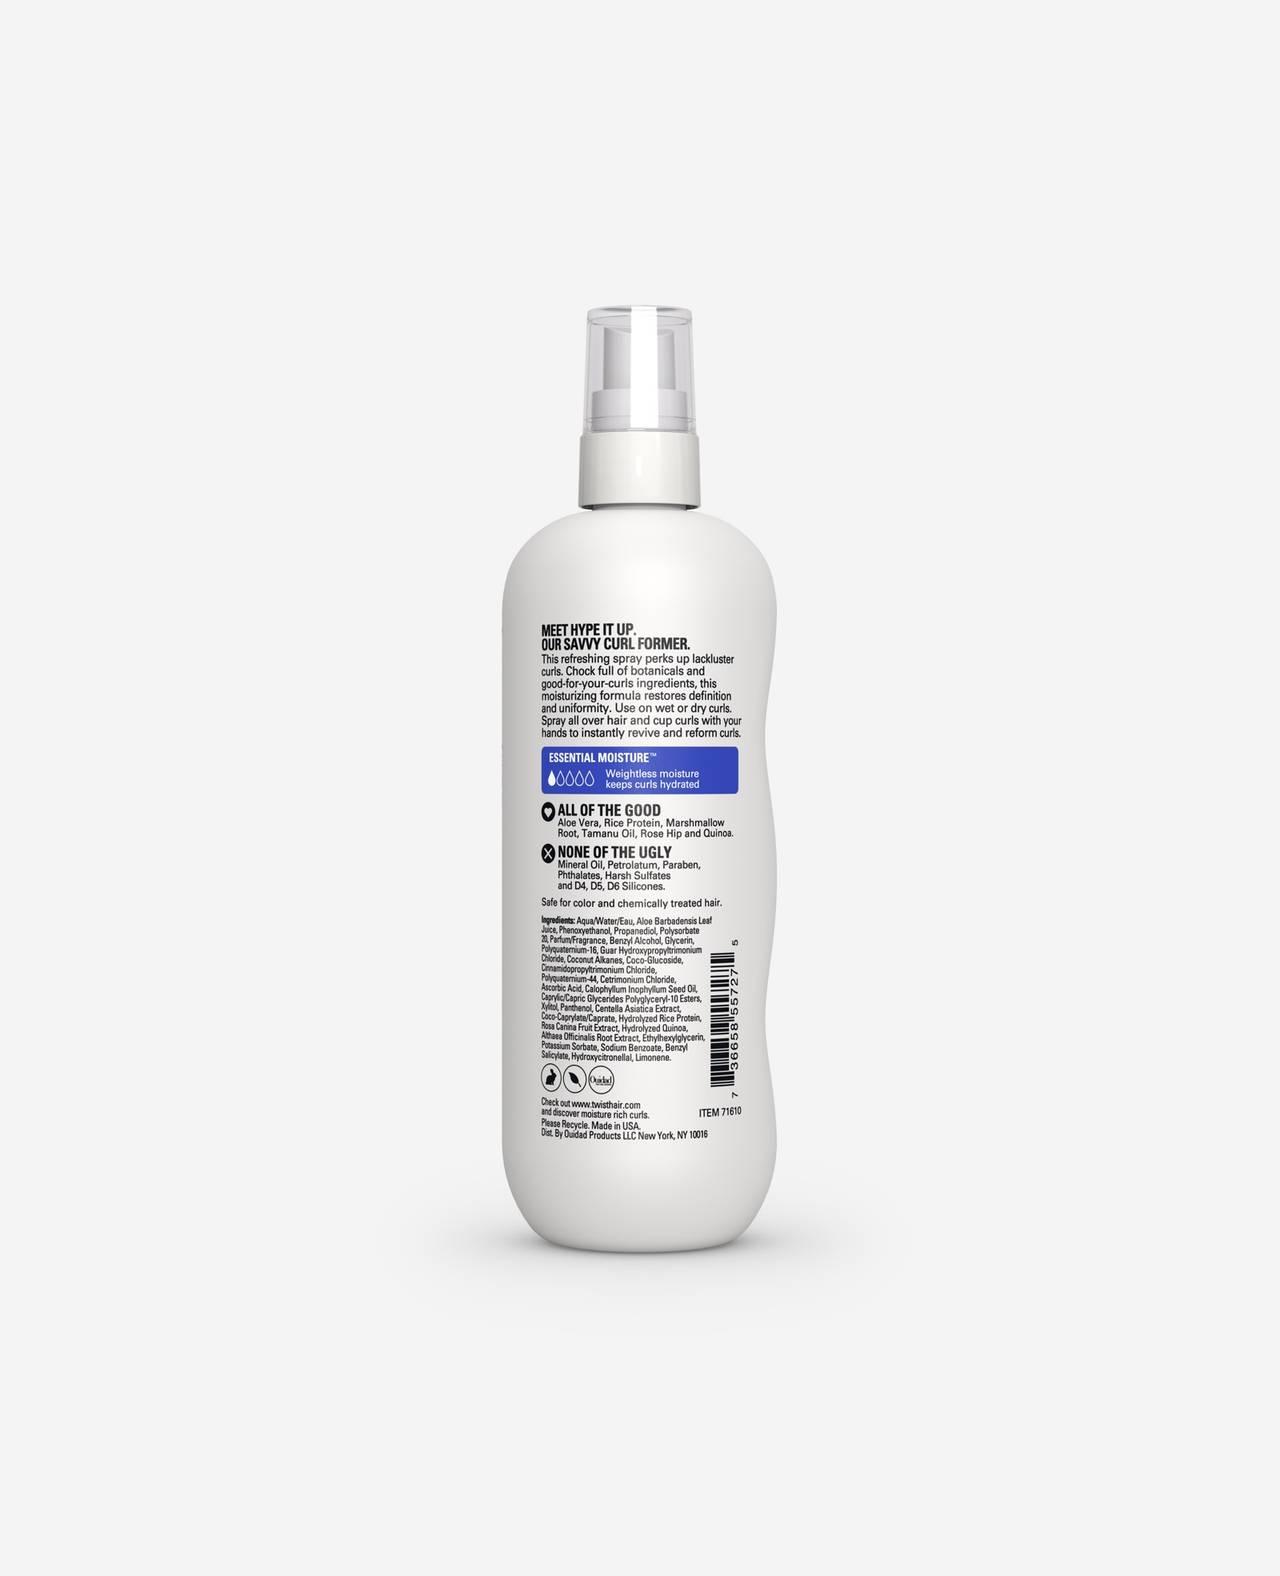 Twist Hype it Up Refreshing Spray Essential Moisture for Curls 10.5 fl. Oz. back of spray bottle